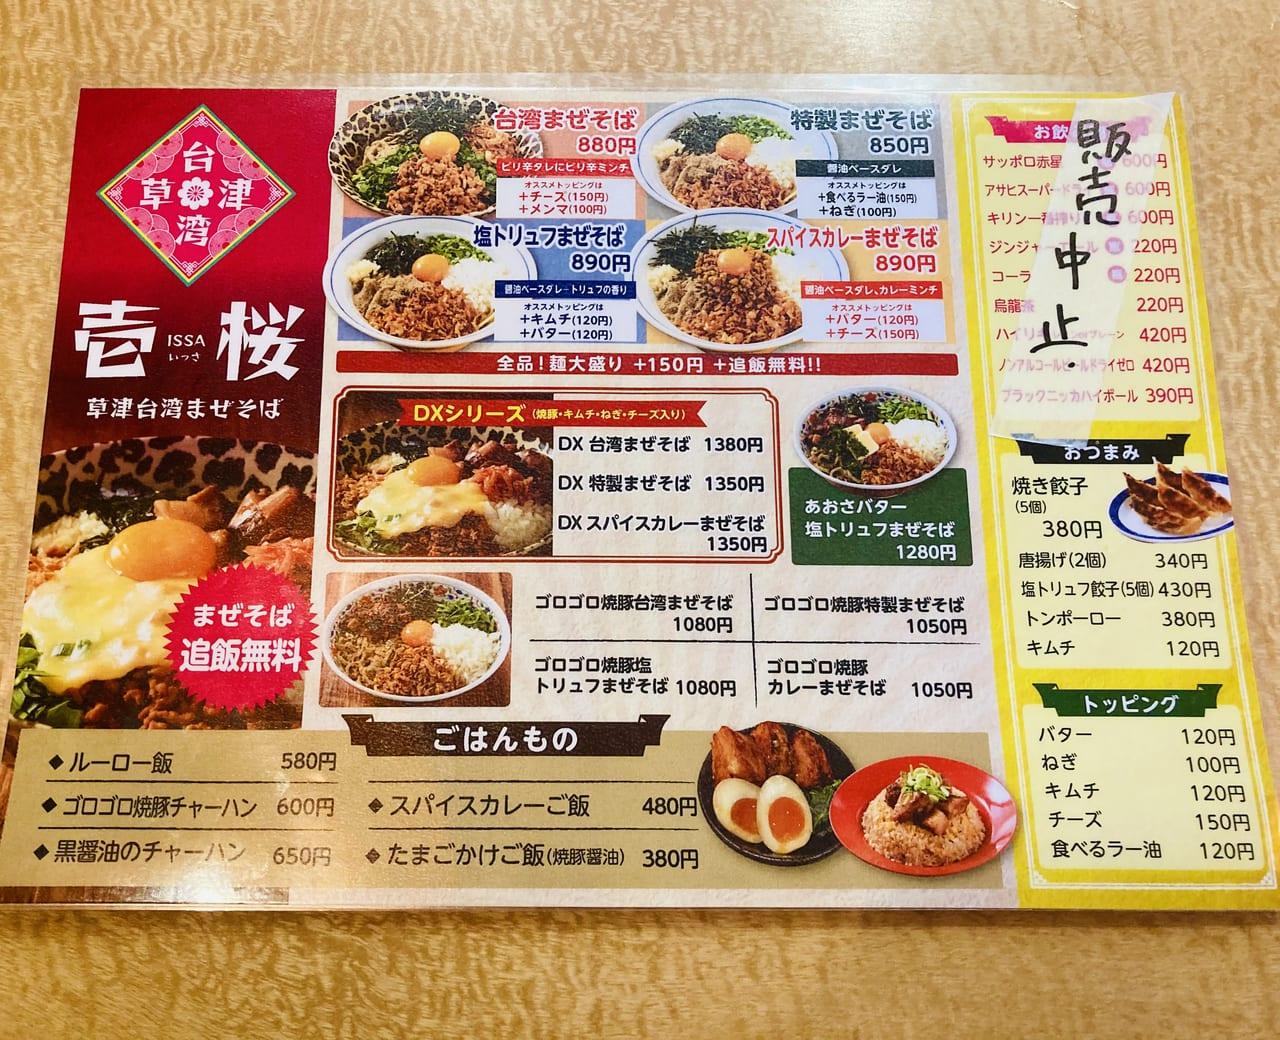 issa menu1